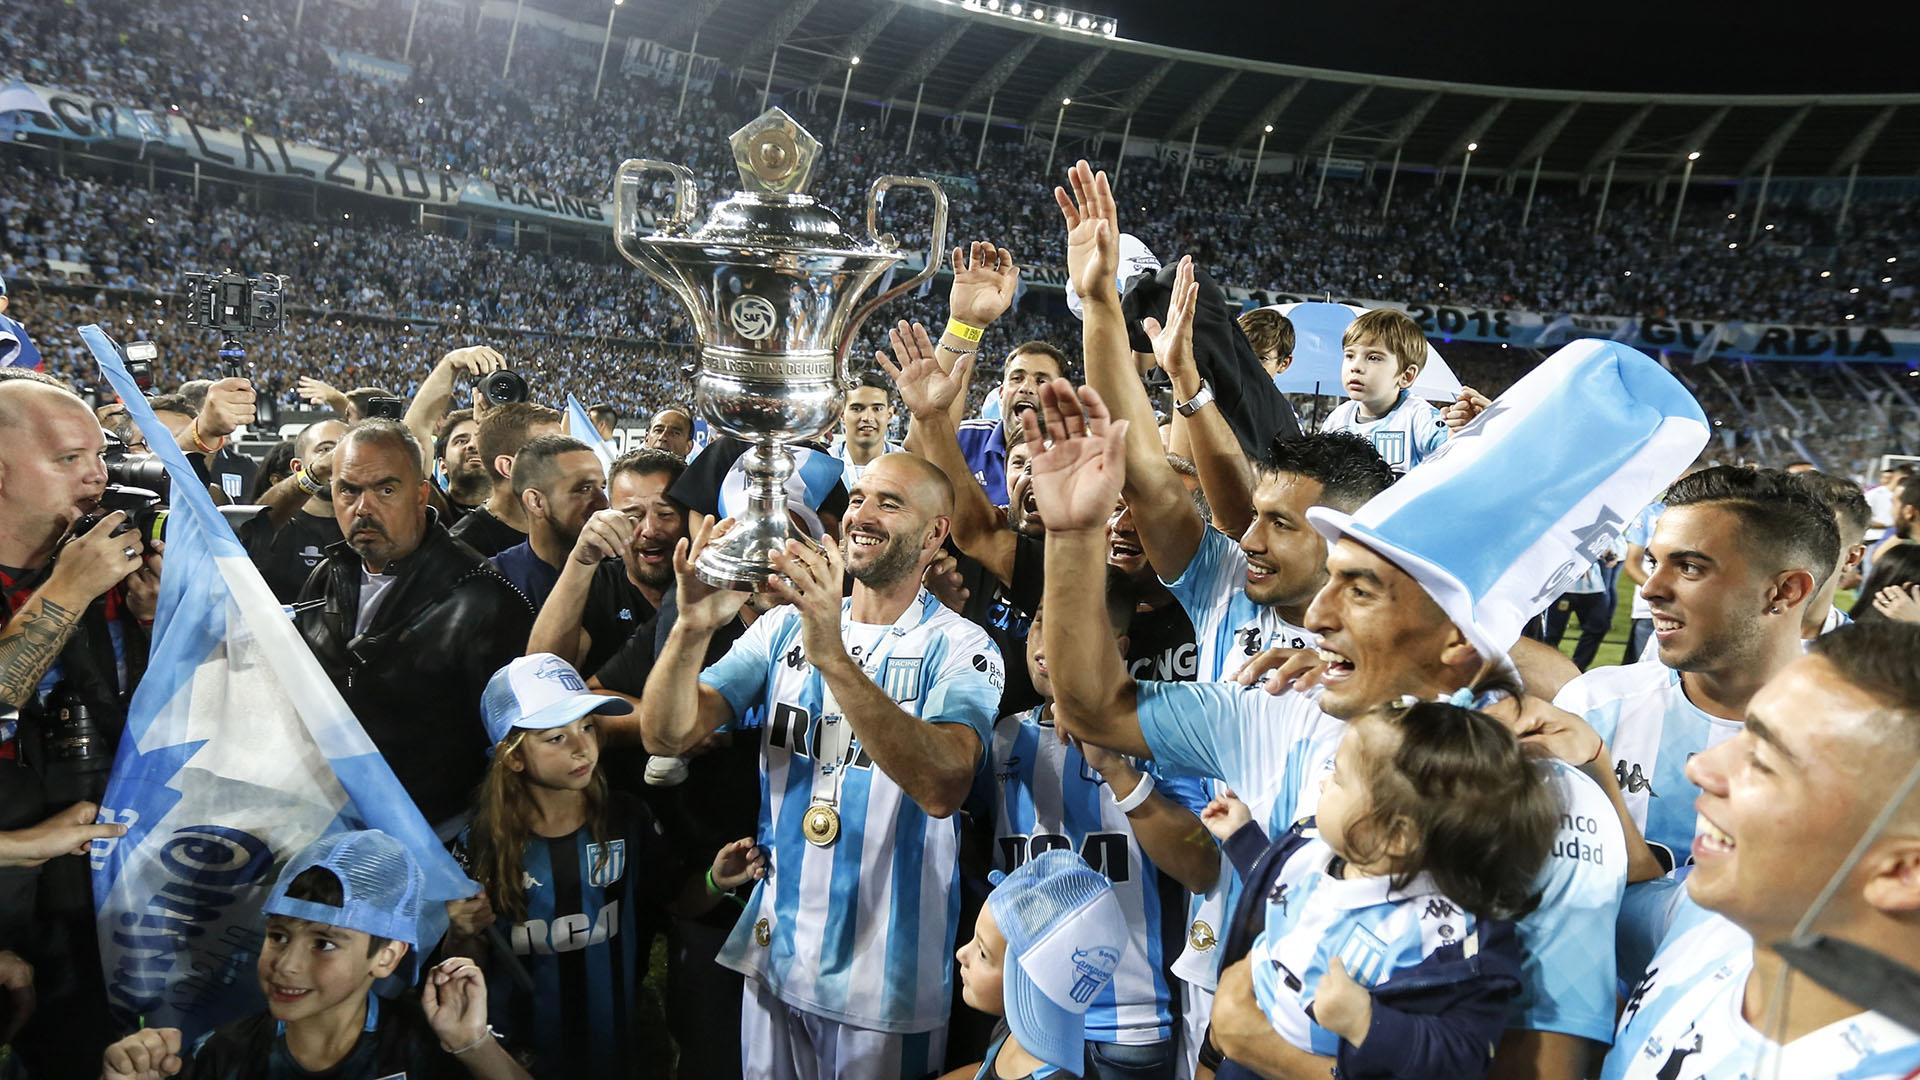 """Licha"" López con el trofeo de la Superliga Argentina, que lo clasificó a Racing a la próxima Copa Libertadores 2020"